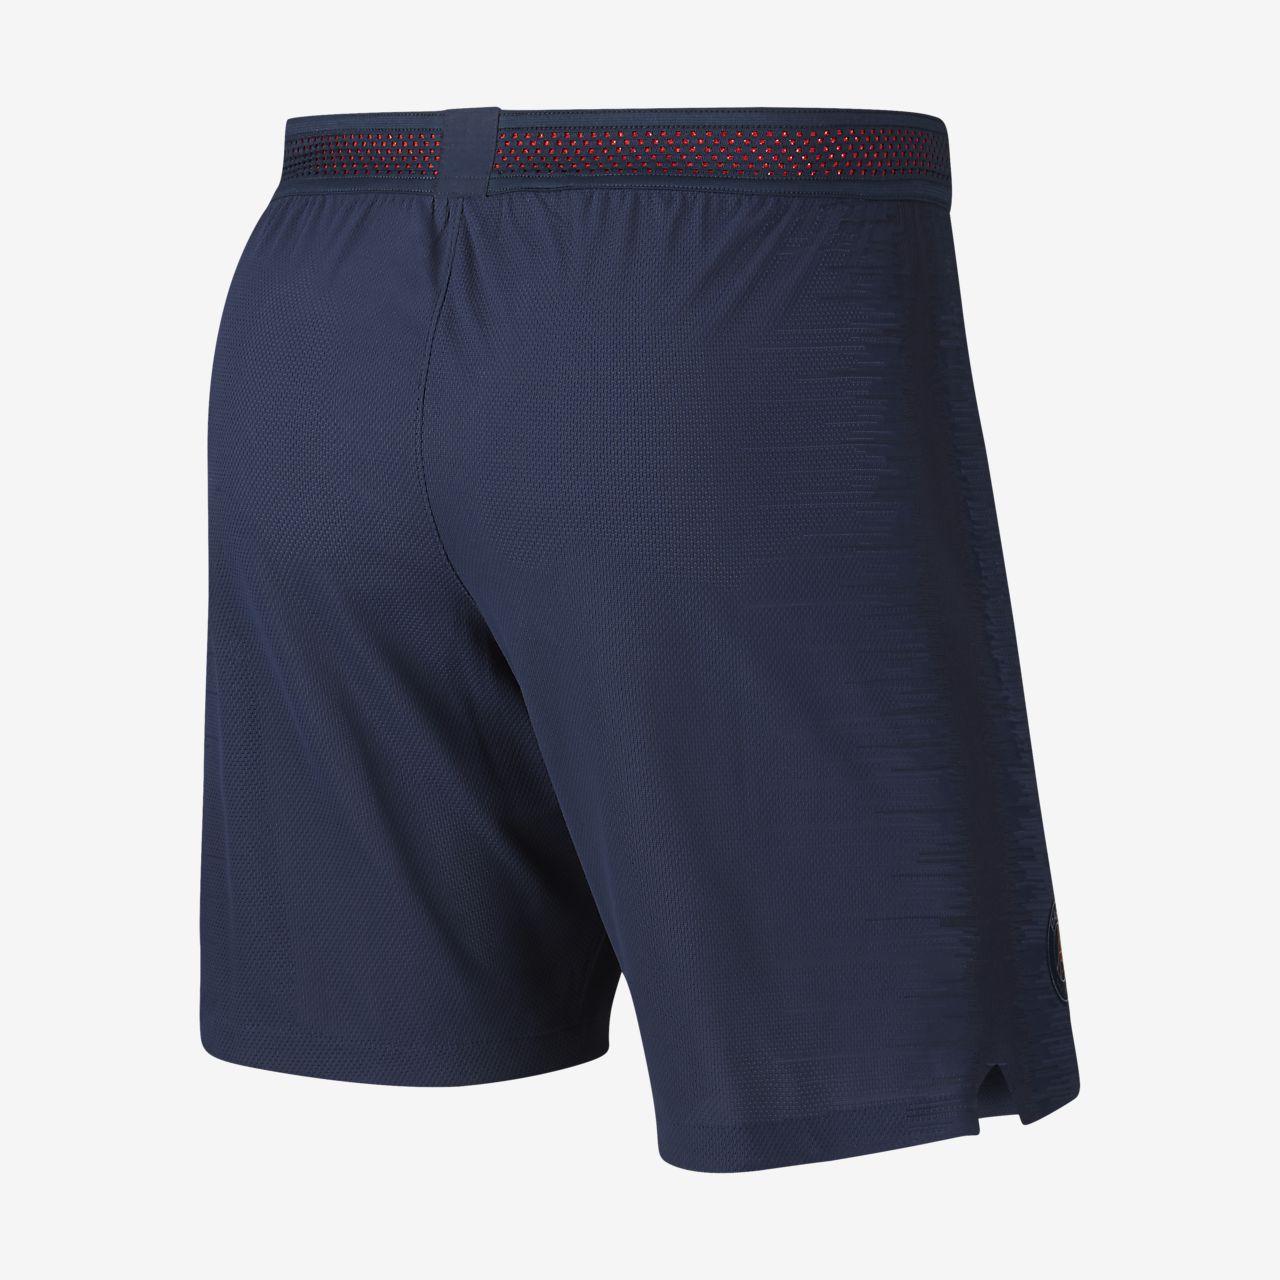 cheap for discount 3ec6d fb420 ... 201819 Paris Saint-Germain Vapor Match HomeAway Mens Football Shorts